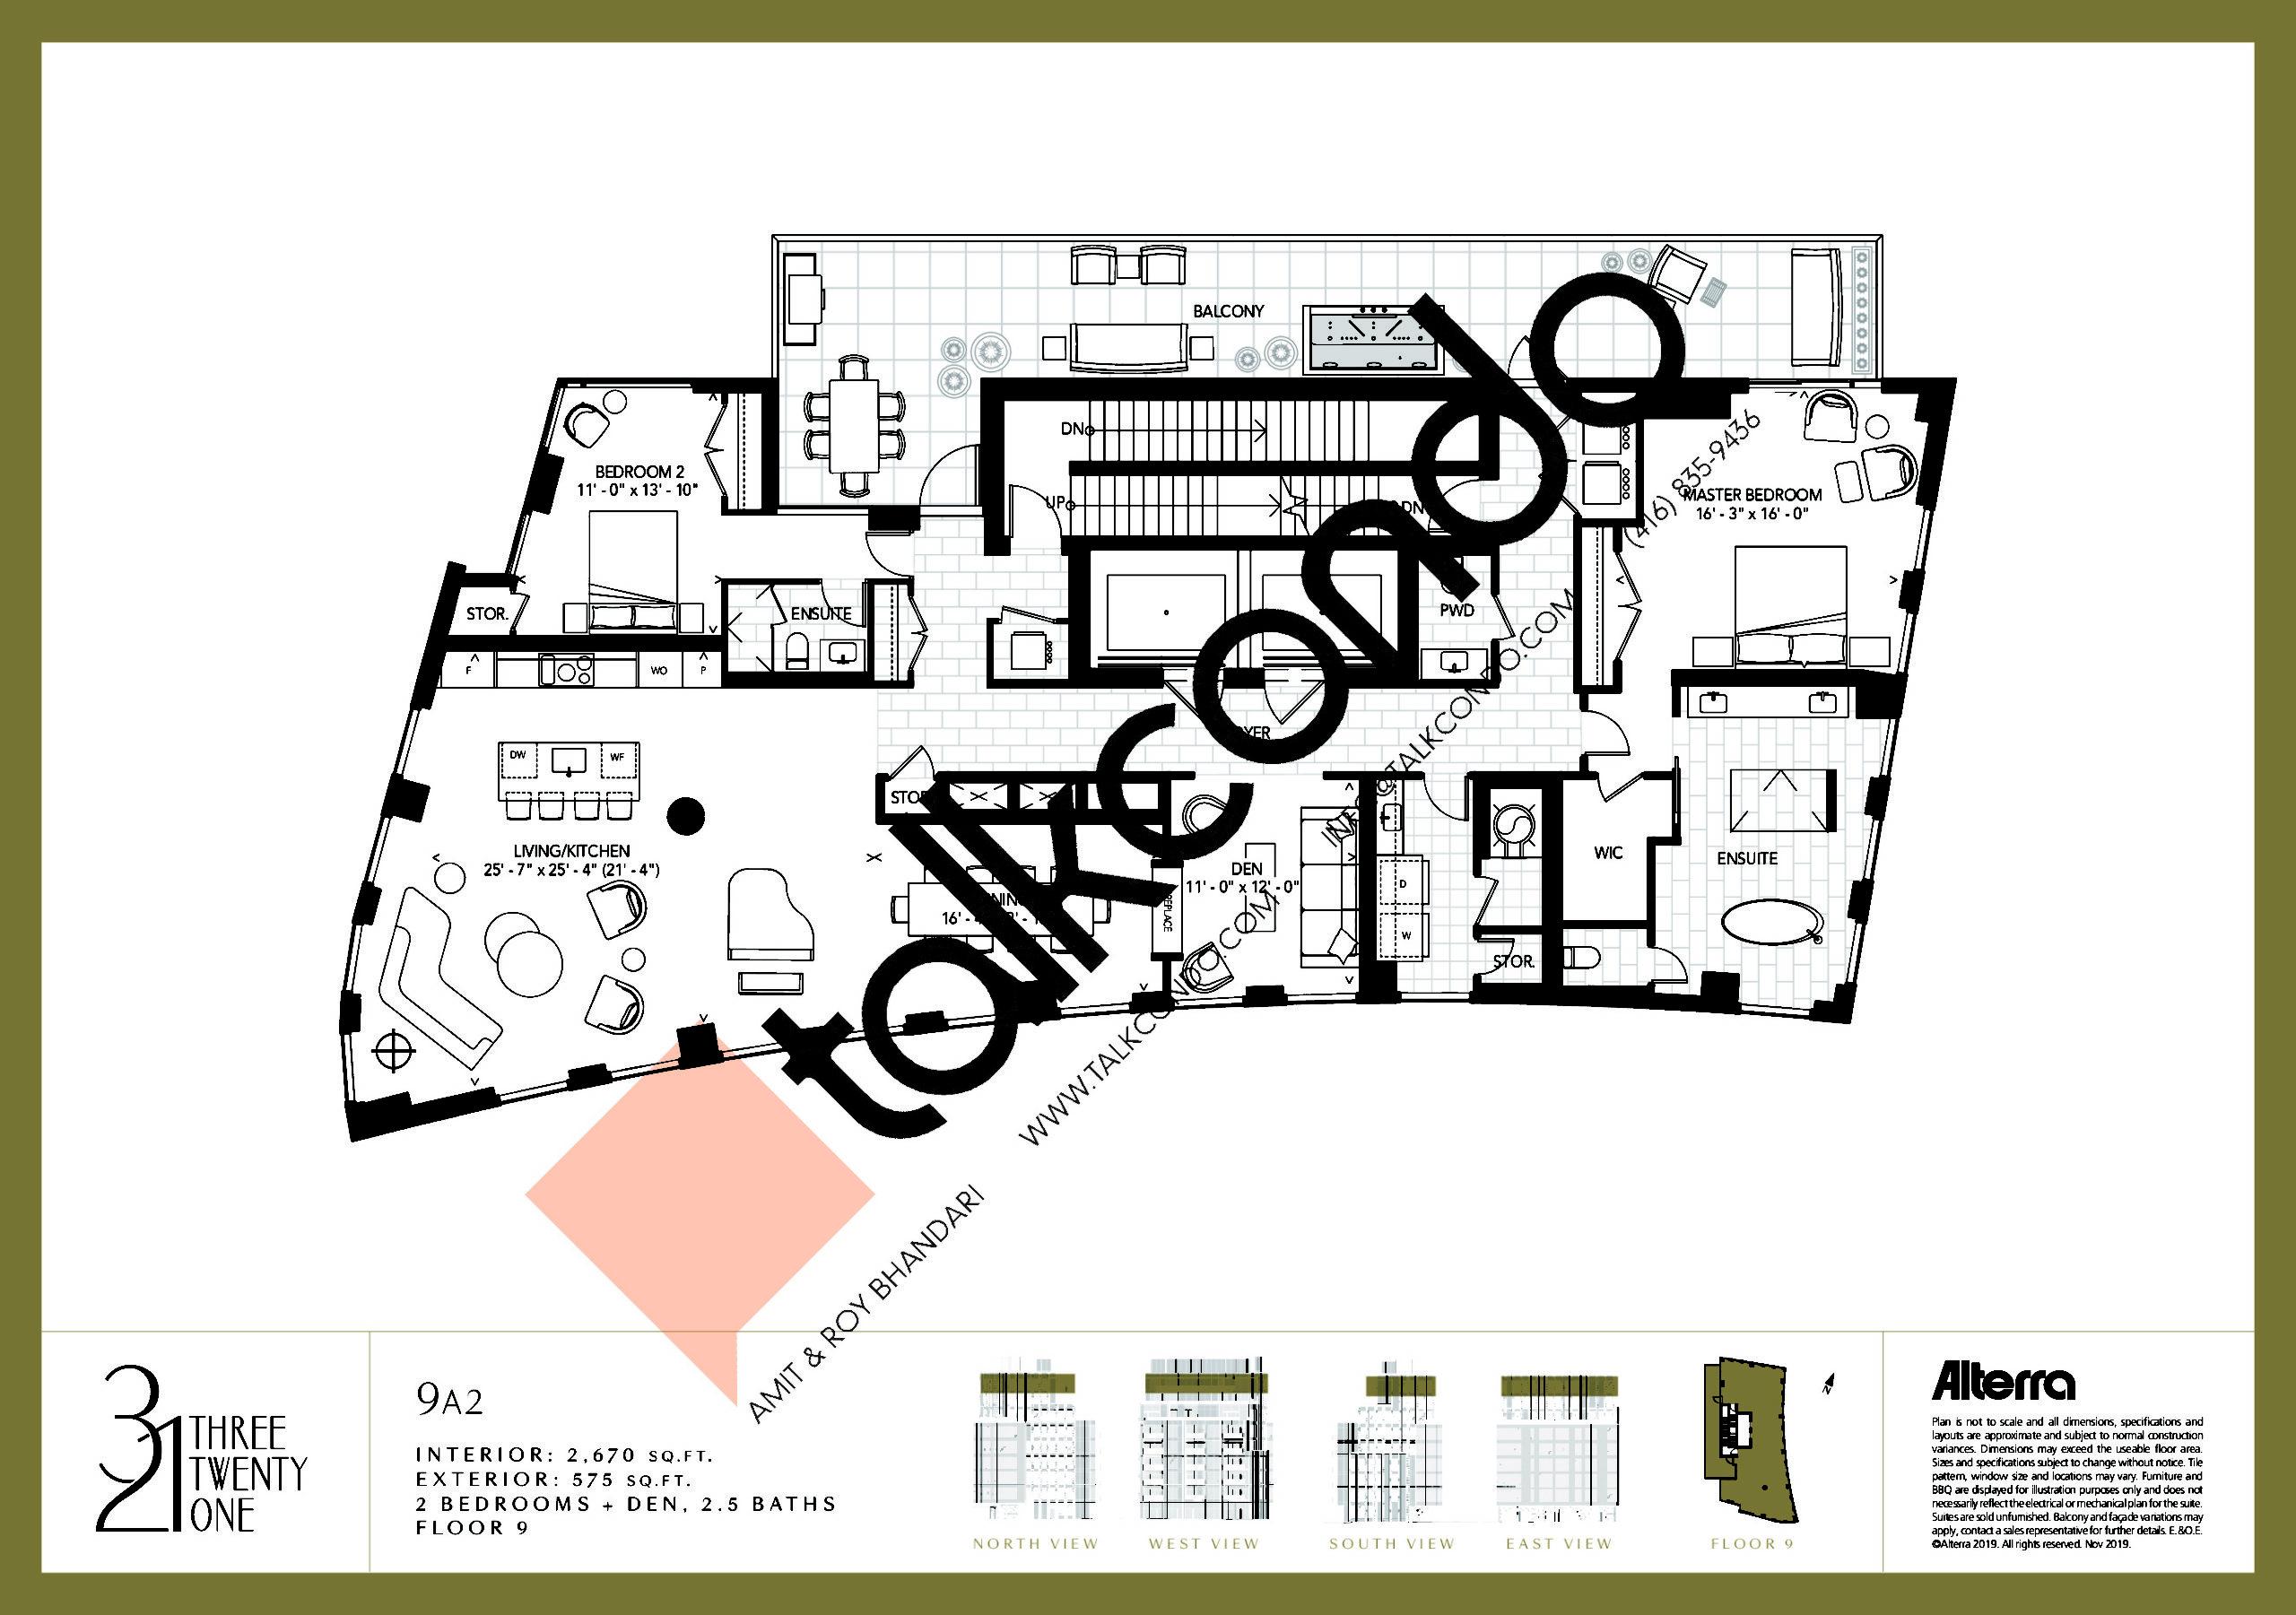 9A2 Floor Plan at 321 Davenport Condos - 2670 sq.ft